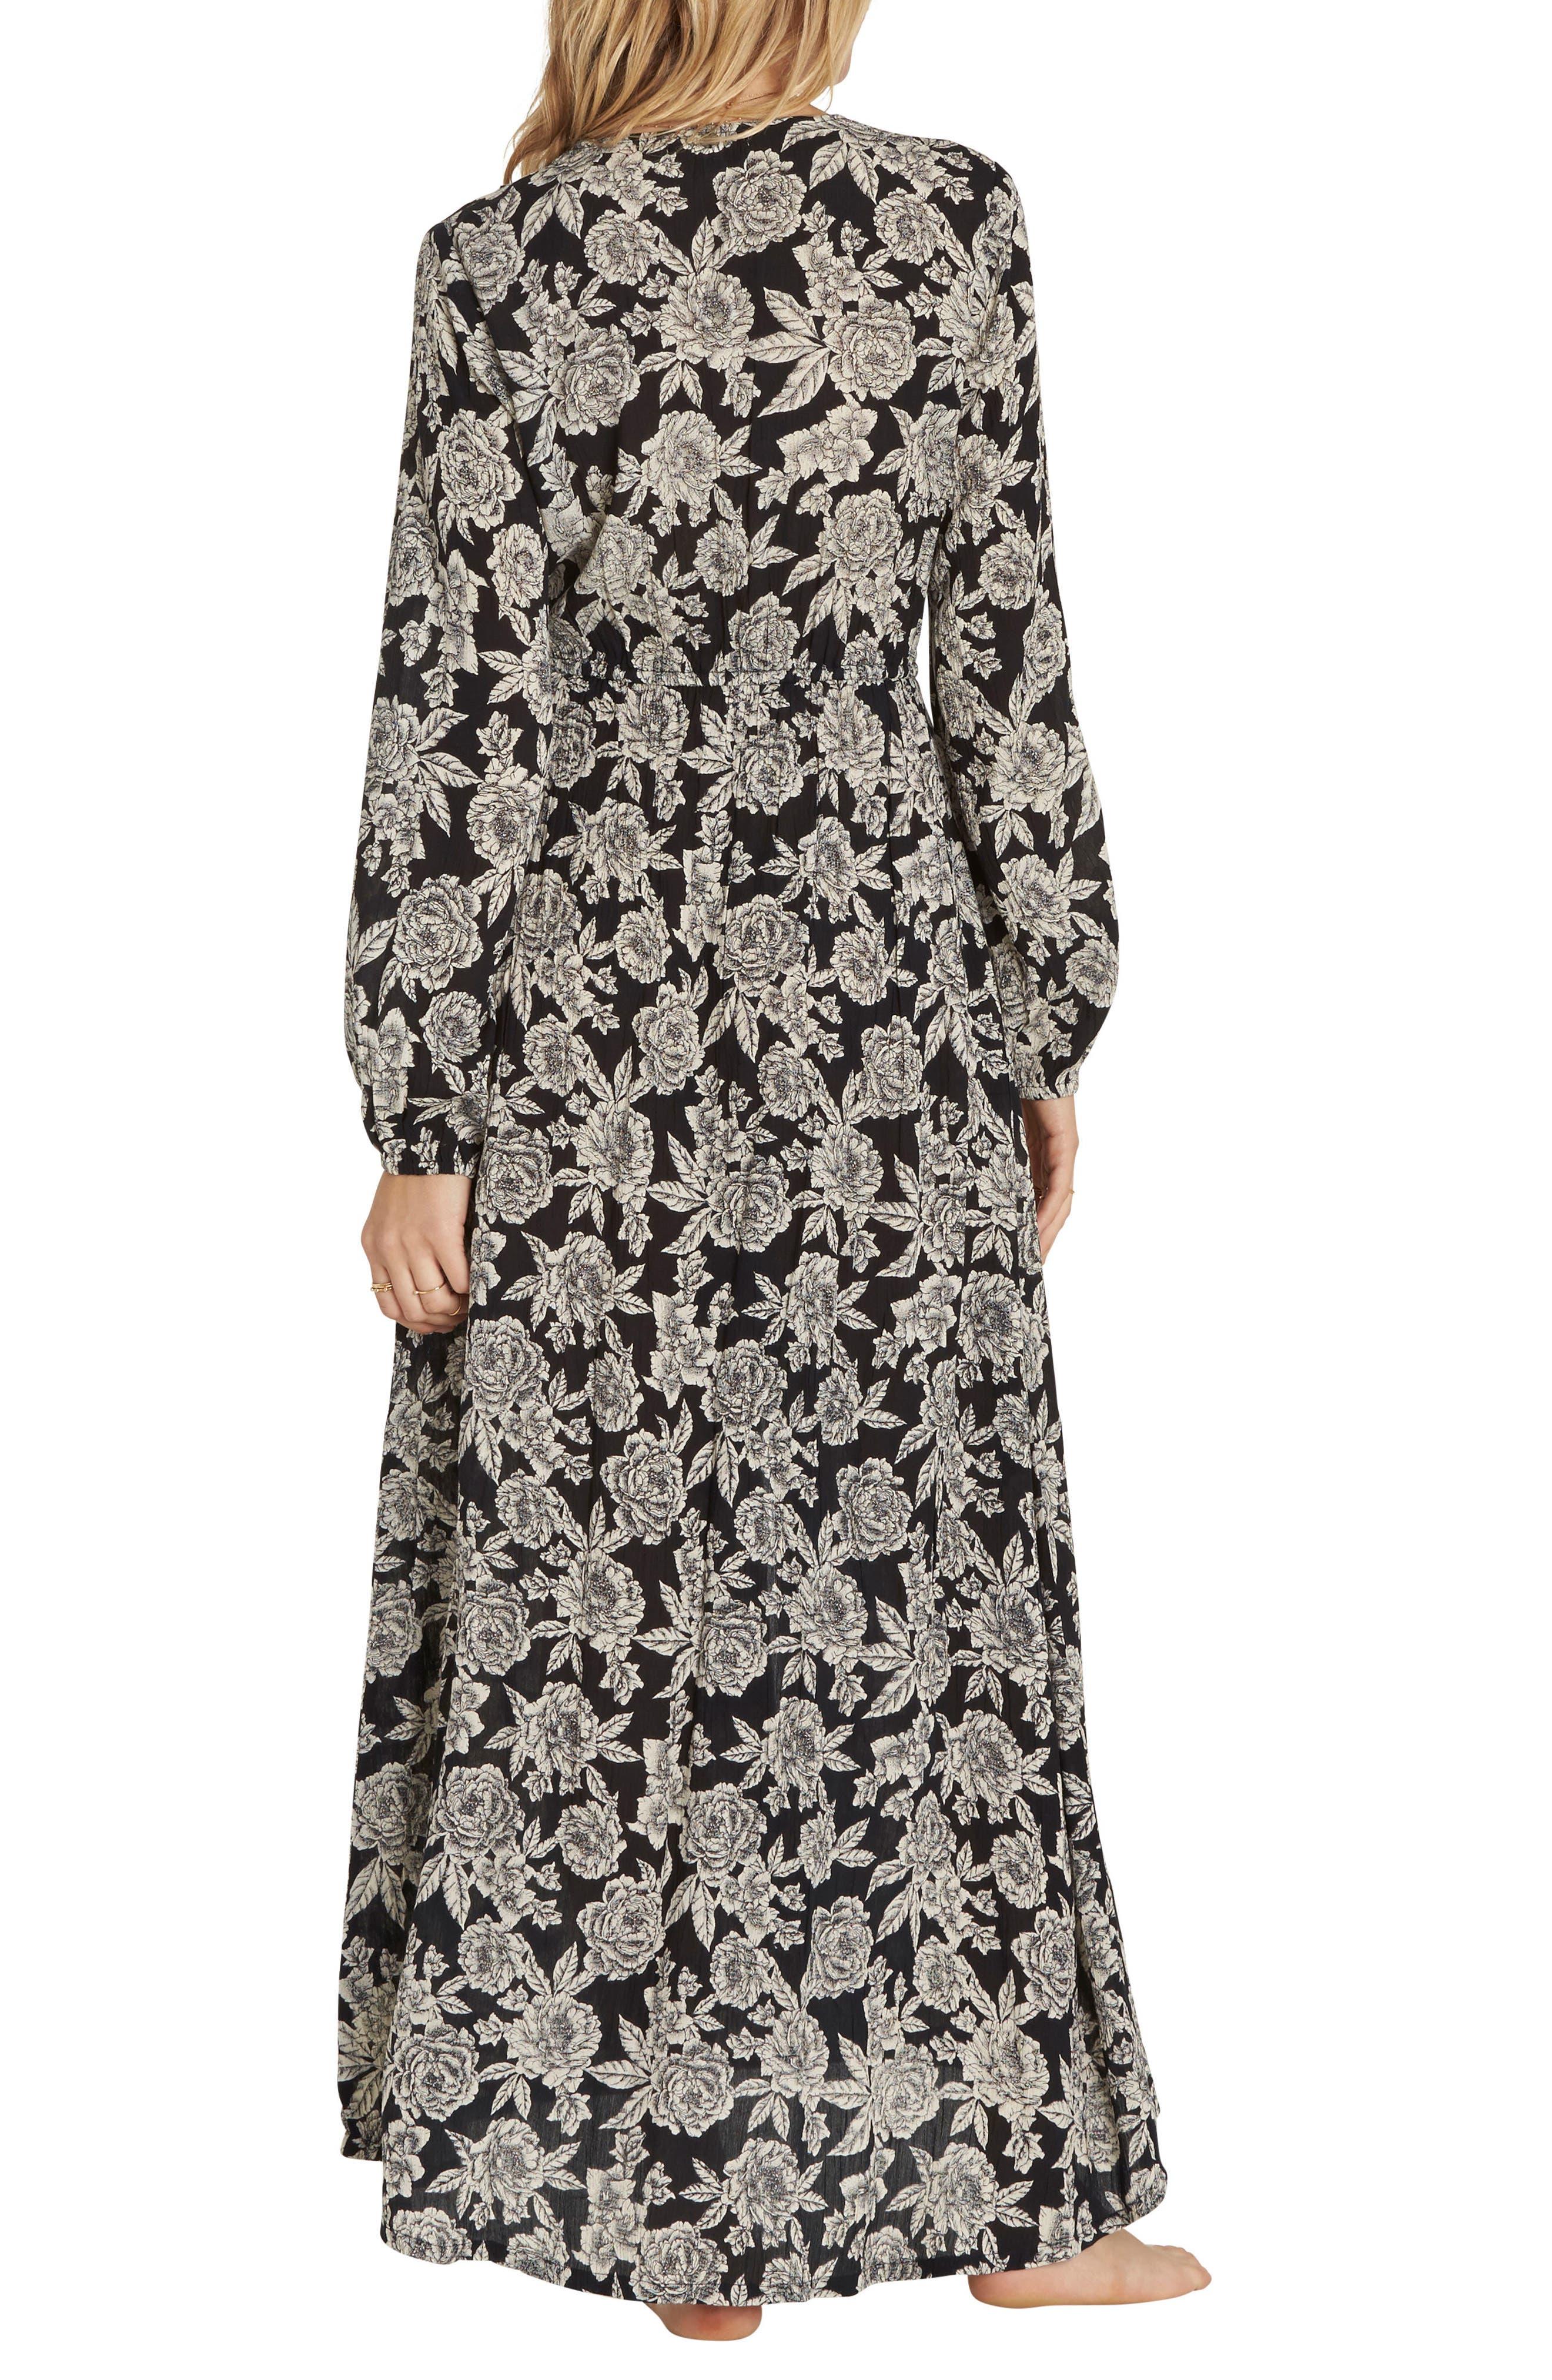 Allegra Kimono Dress,                             Alternate thumbnail 2, color,                             Black/ White